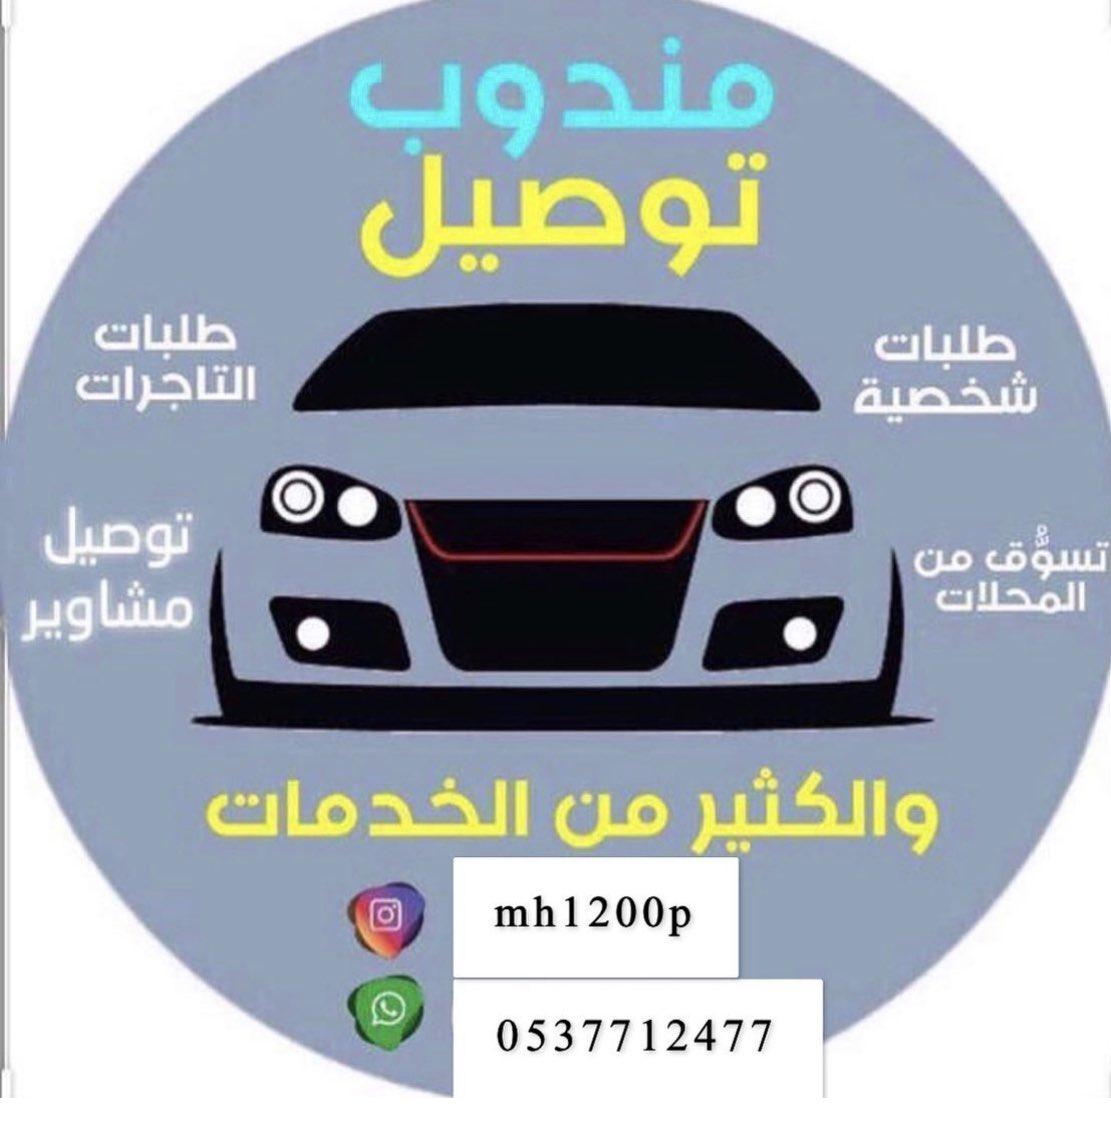 مندوب طلبات داخل تبوك Taxi36843449 Twitter